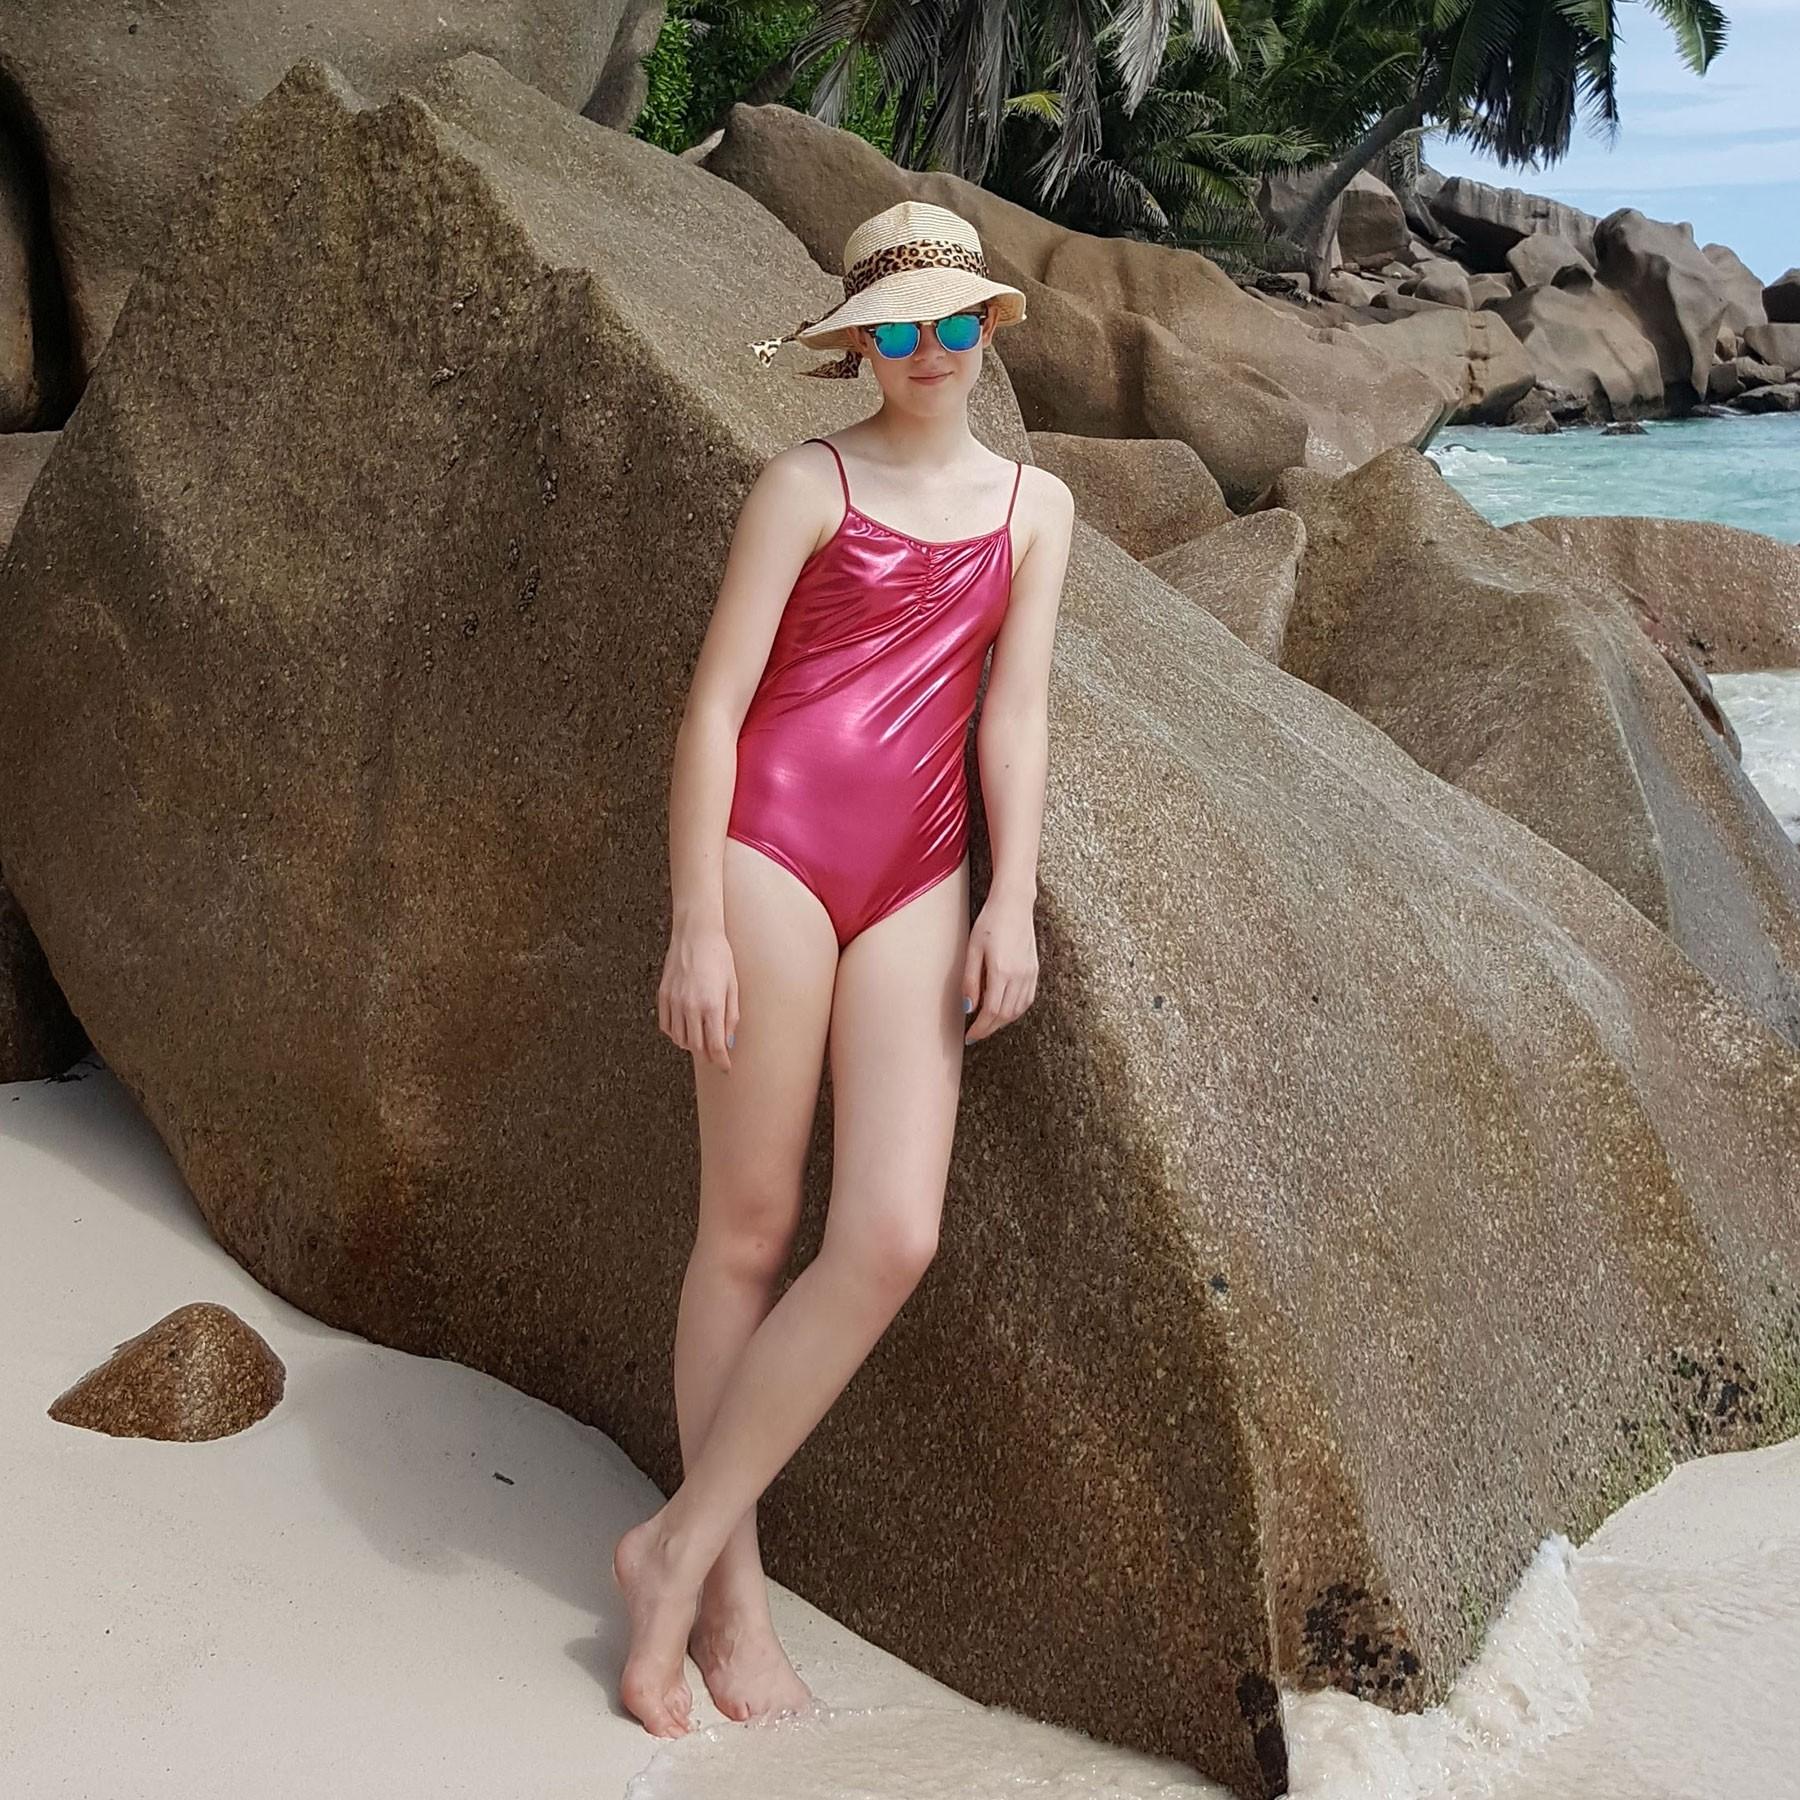 ausgefallner Badeanzug Teenager Rot Seychellen